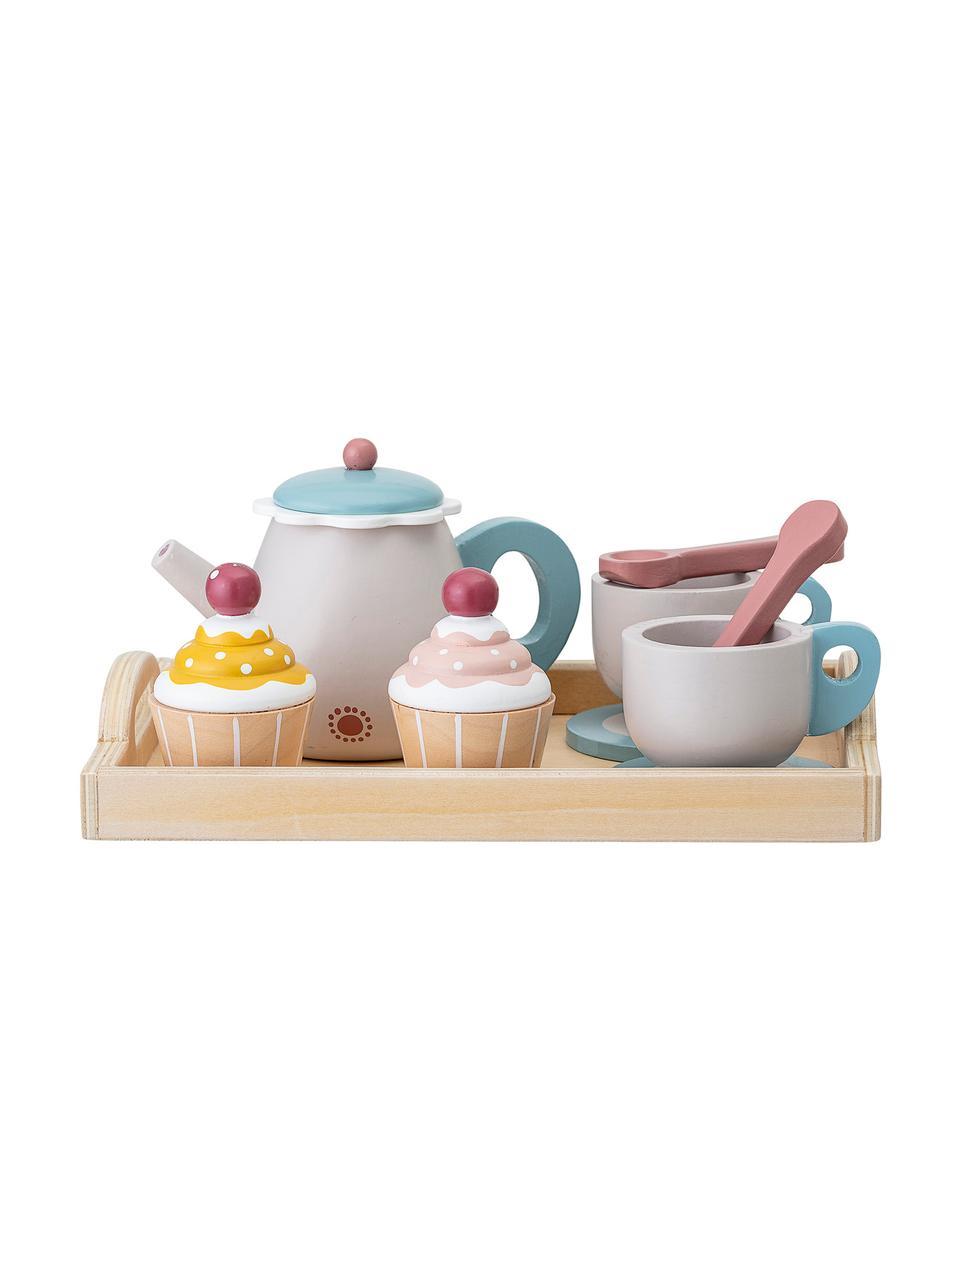 Spiel-Set Coffee Time, 13-tlg., Schichtholz, Lotusholz, Mehrfarbig, 21 x 10 cm